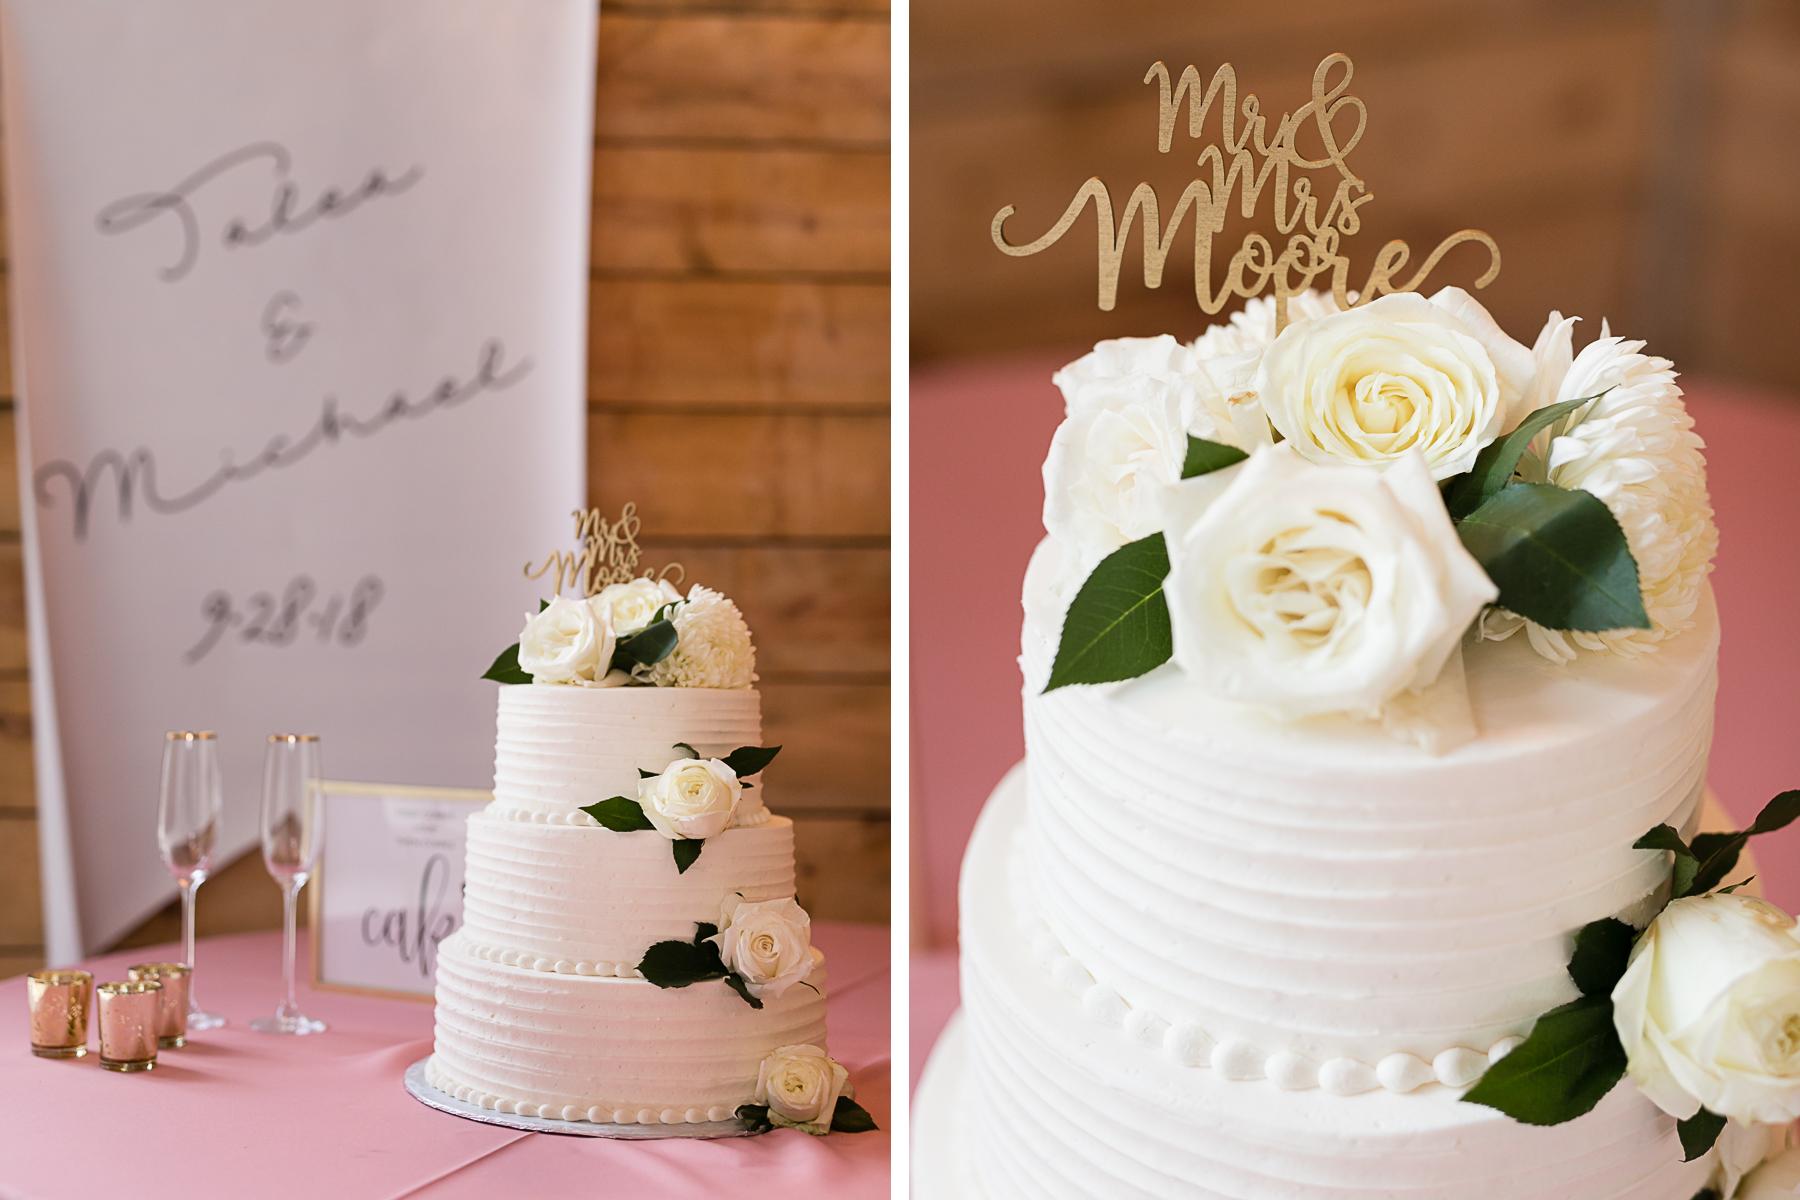 classic-wedding-cake-ideas.jpg